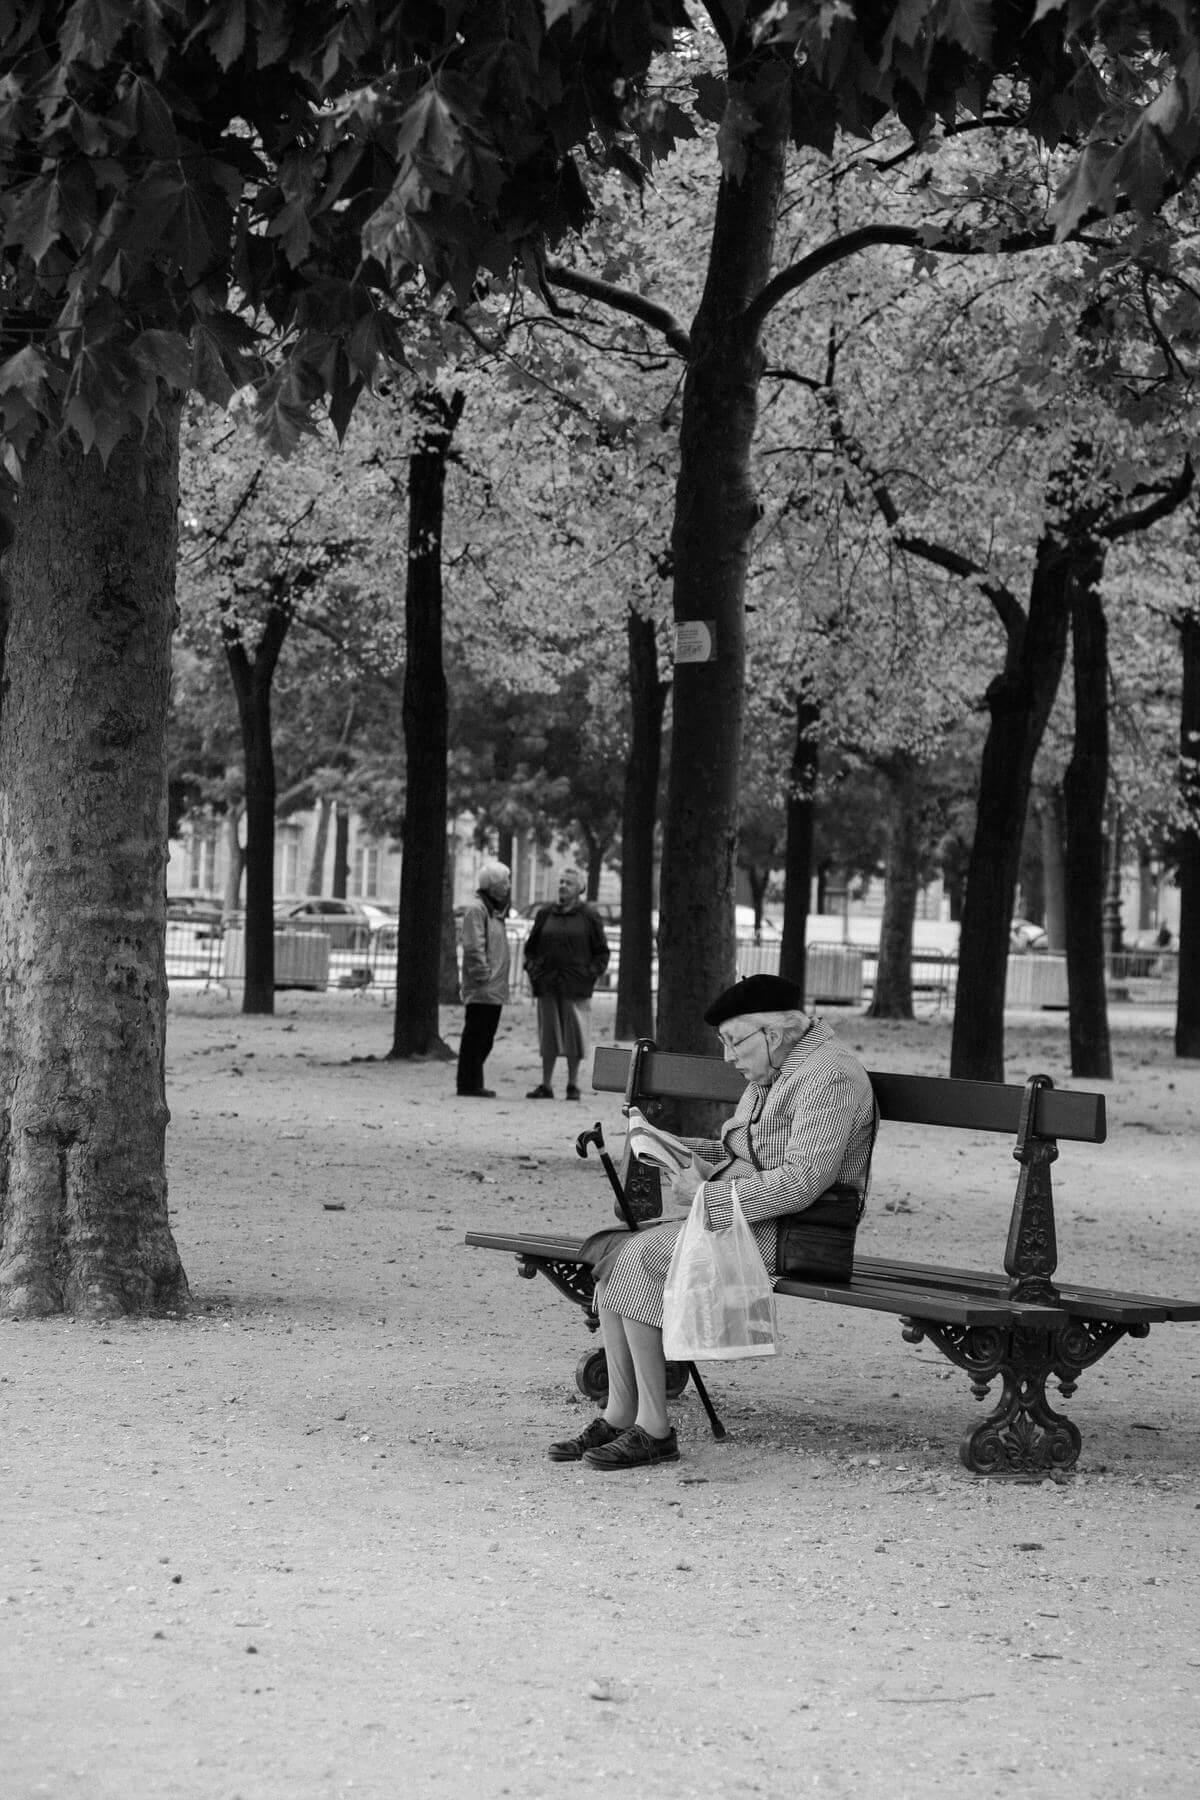 Paris-France-black-and-white-fine-art-photography-by-Studio-L-photographer-Laura-Schneider-_5132